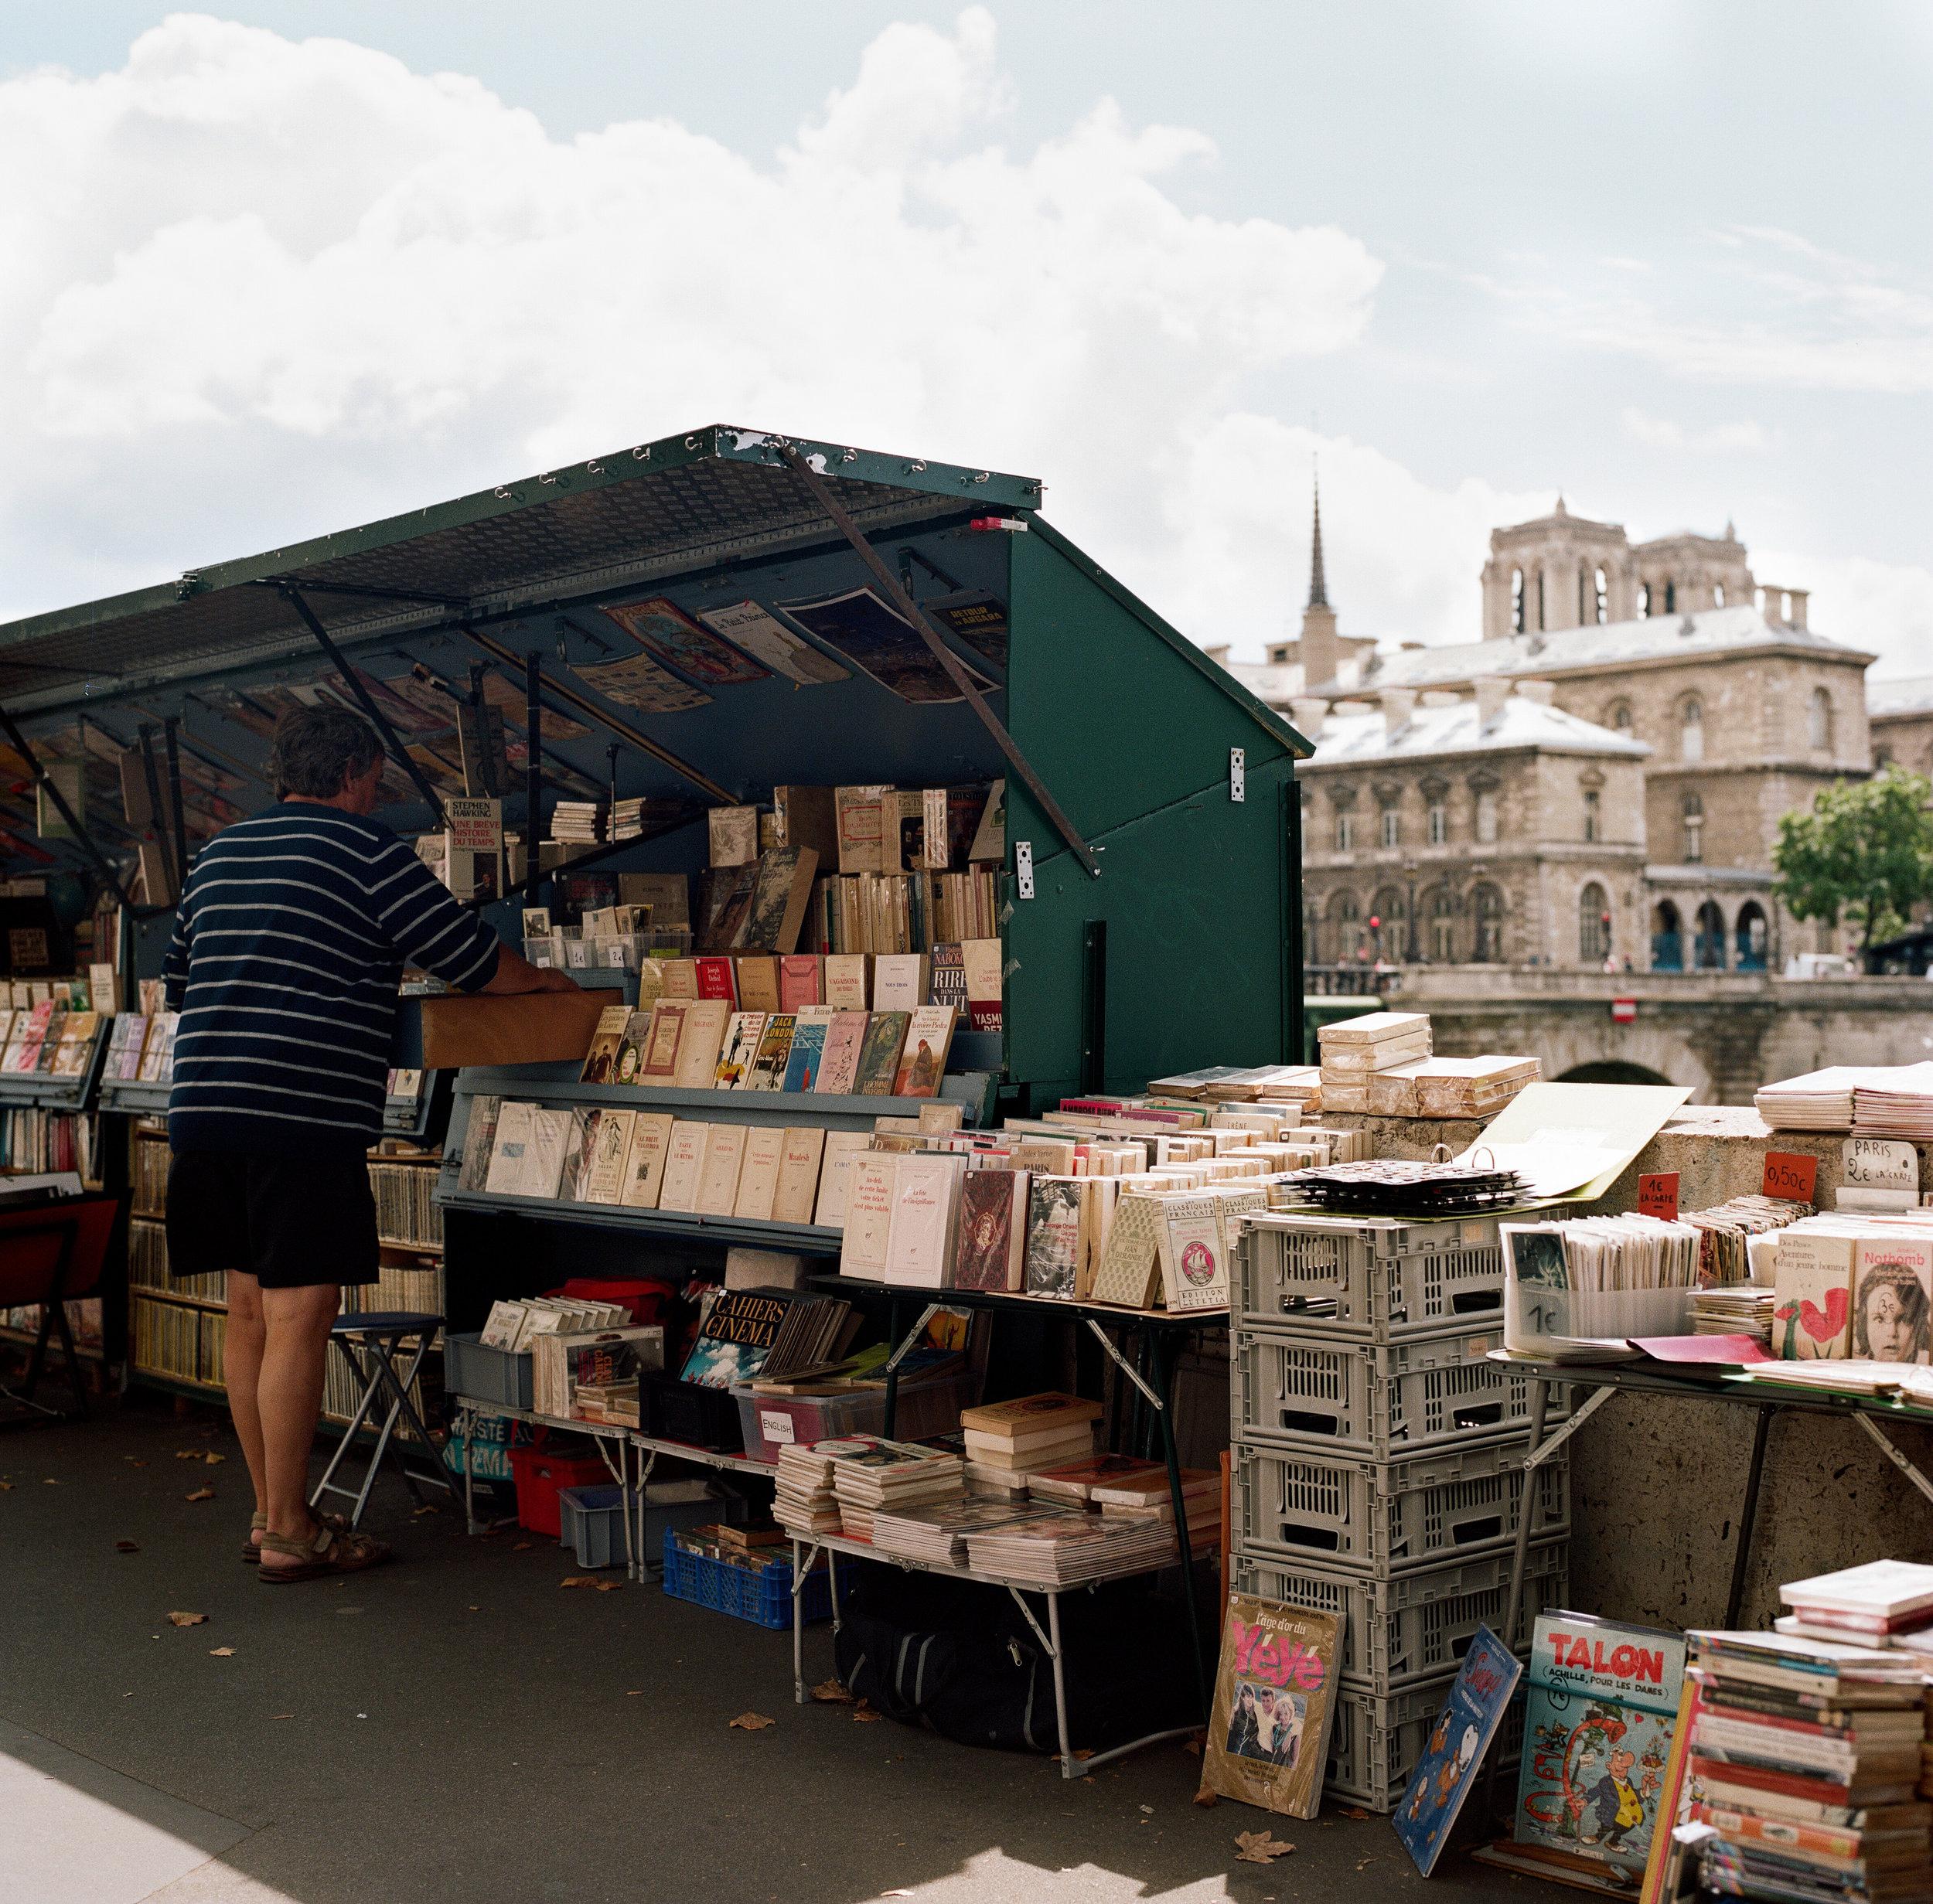 ParisFilm_2017_AdamDillon_000096250004.jpg